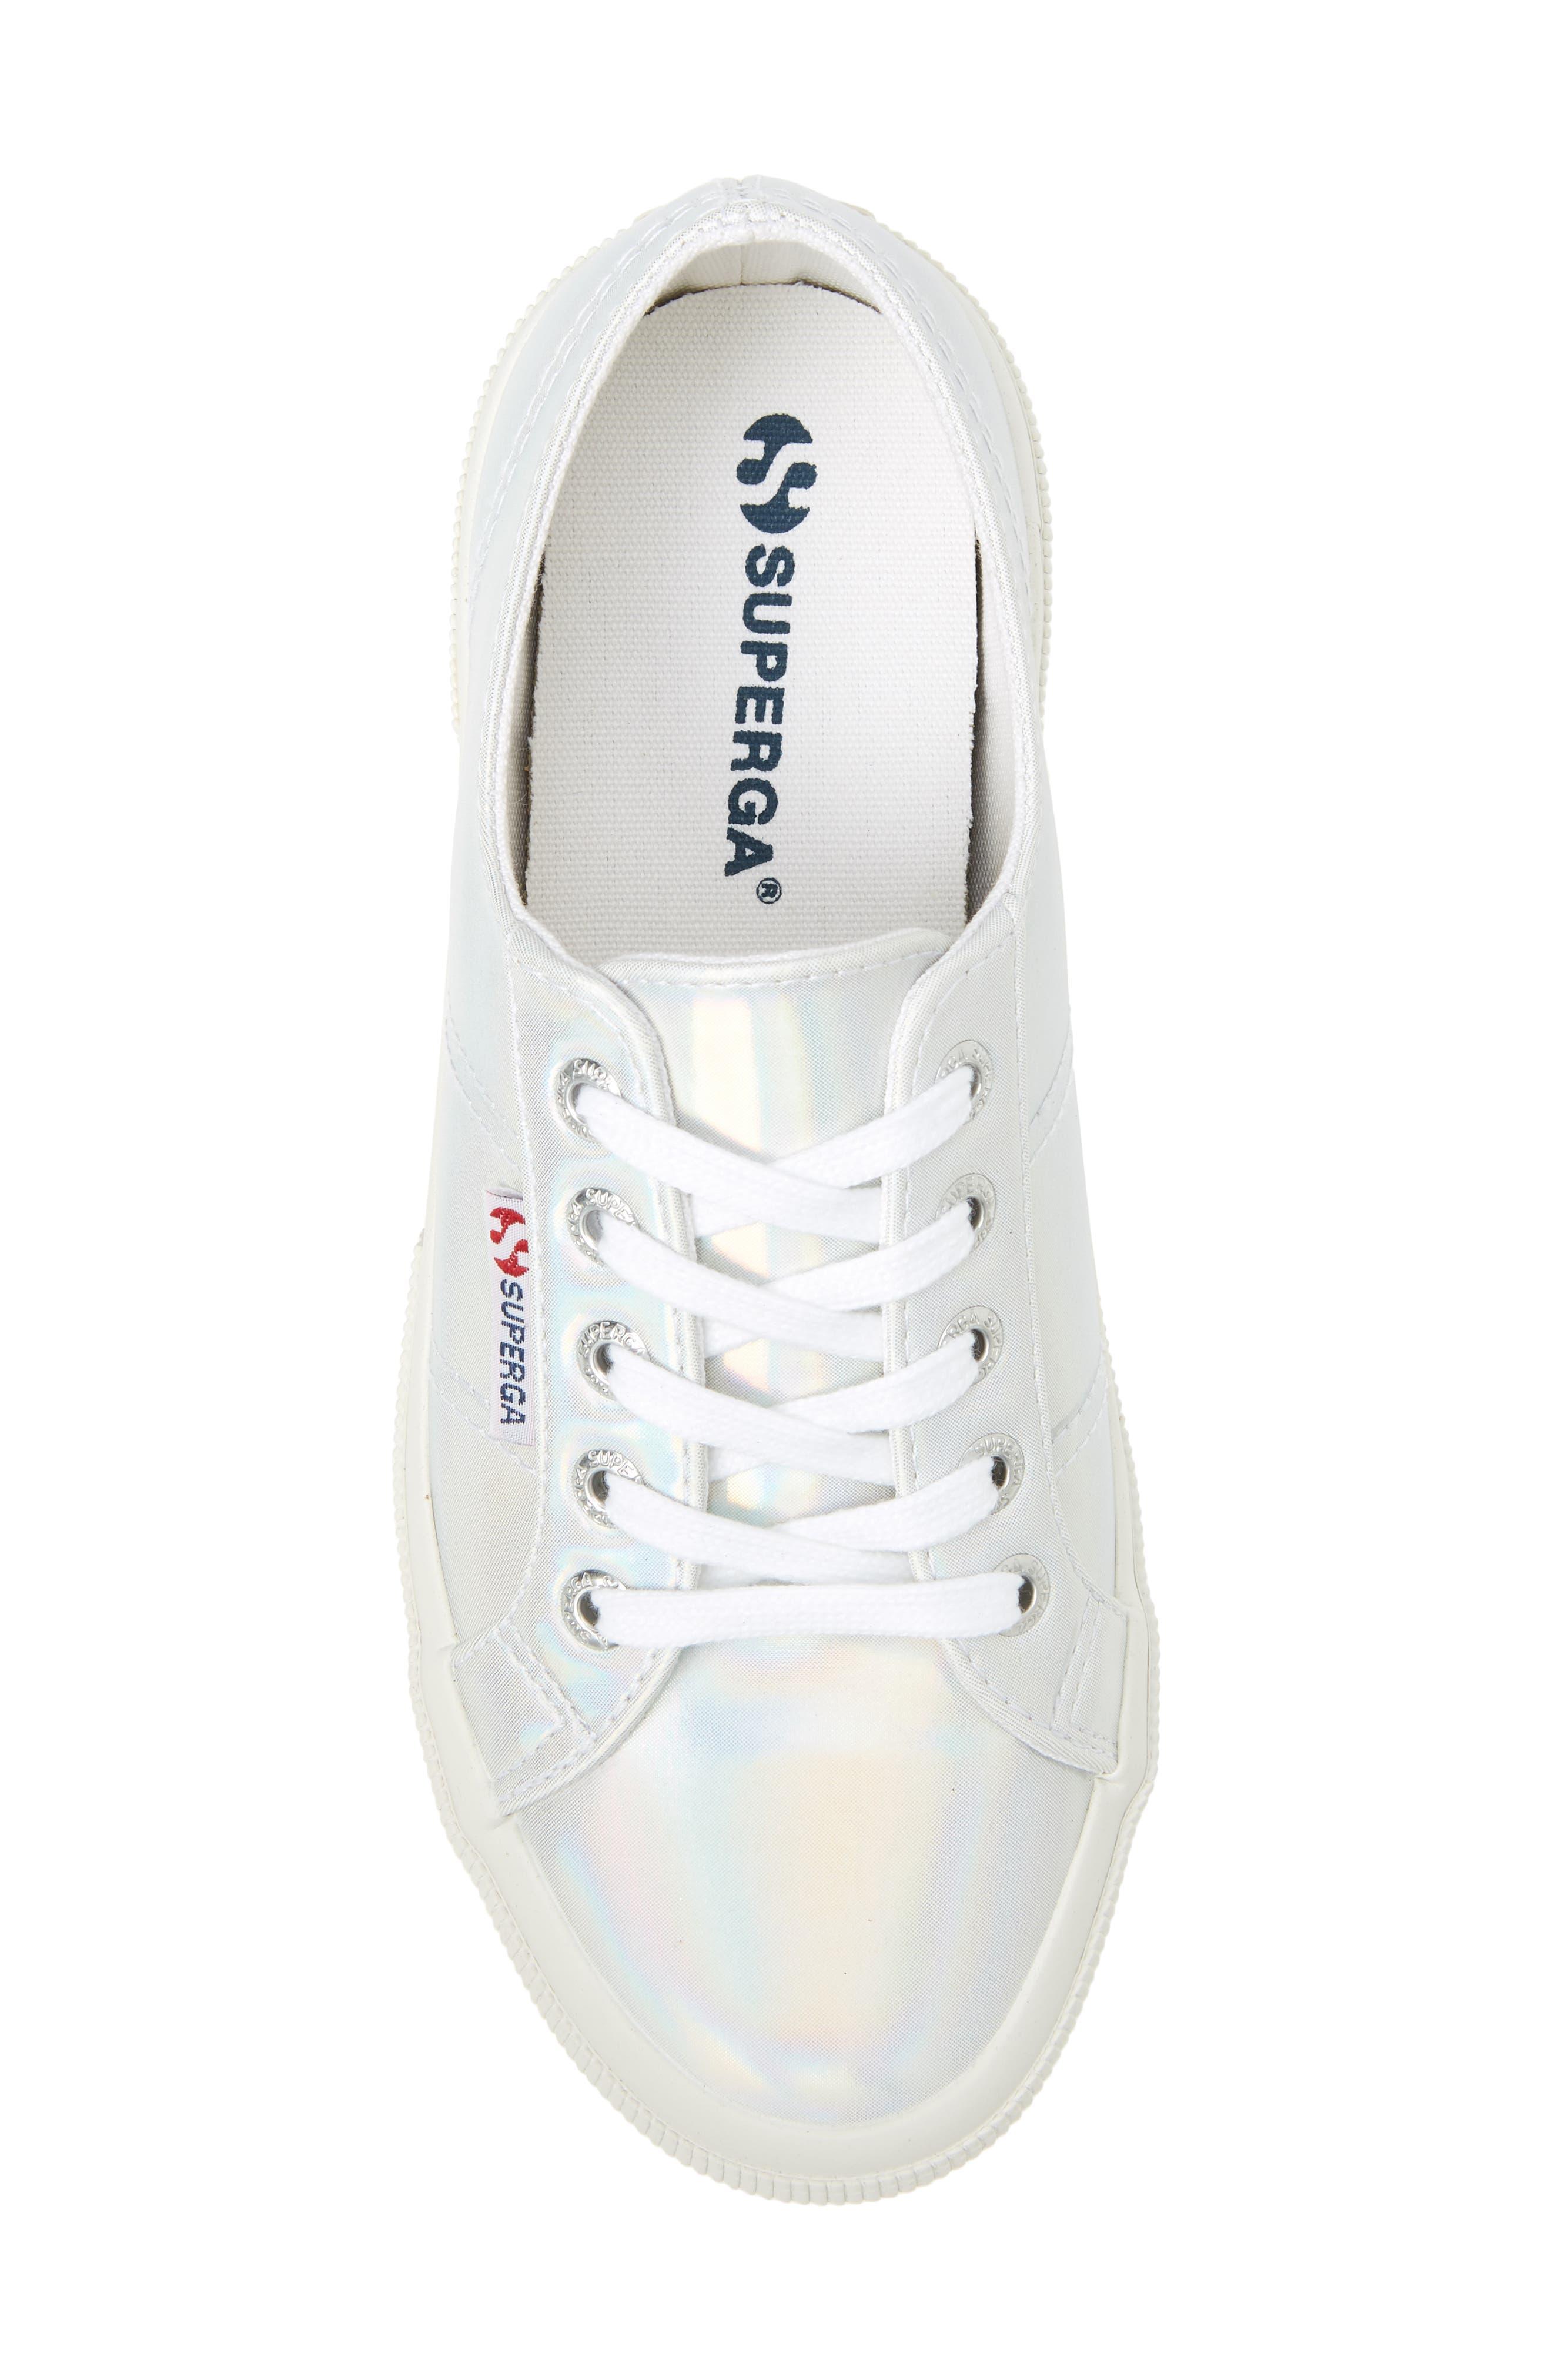 2750 Hologramw Low Top Sneaker,                             Alternate thumbnail 5, color,